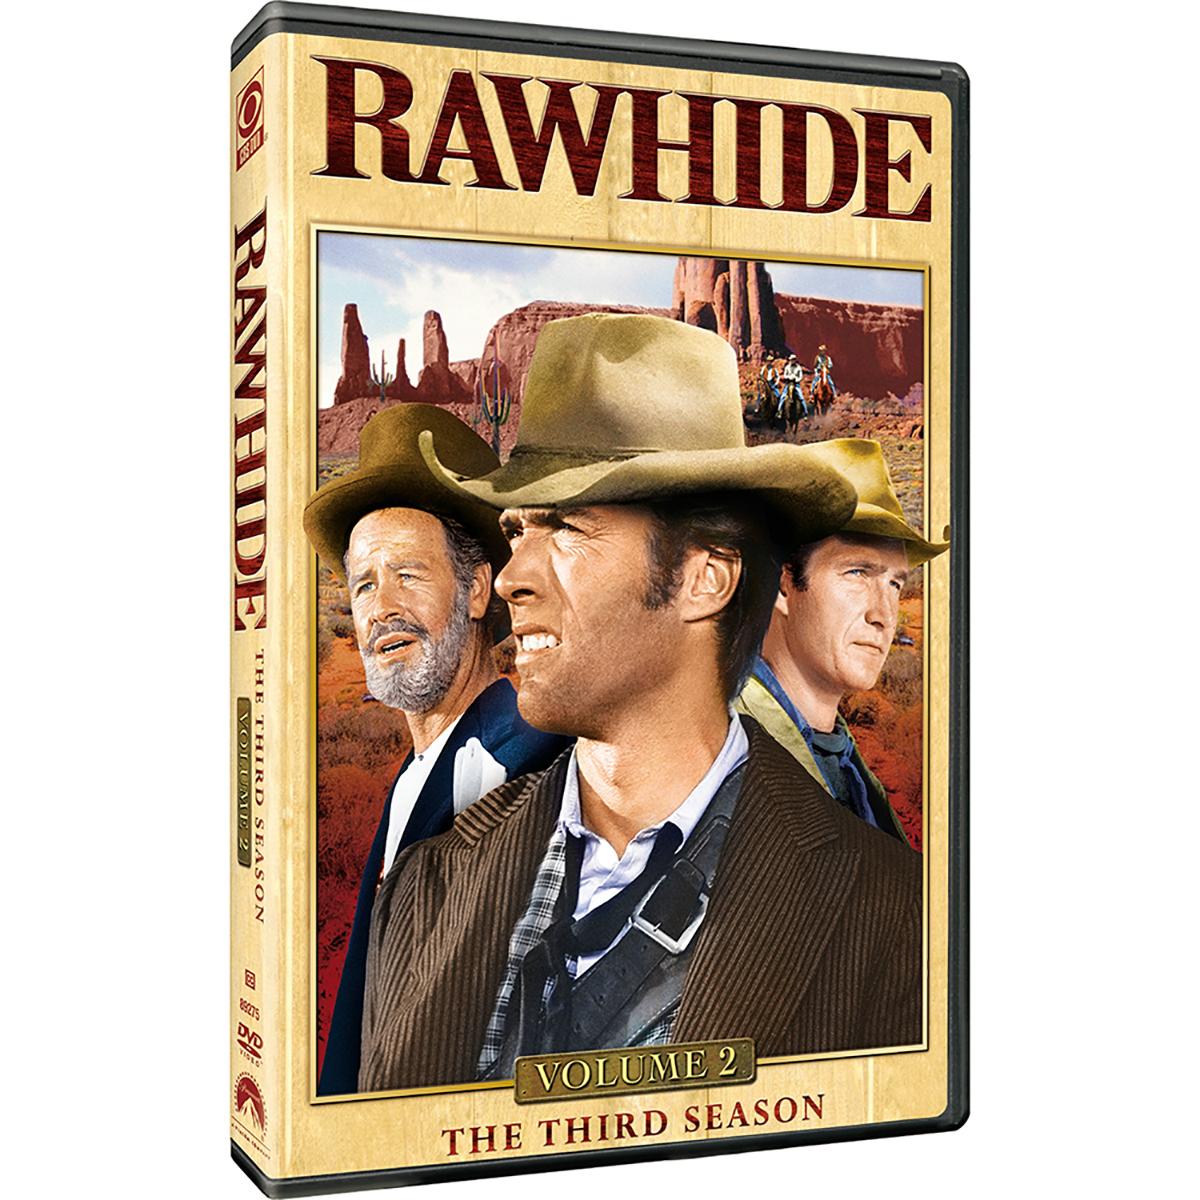 Rawhide: Season 3 - Volume 2 DVD -  DVDs & Videos 192-73817